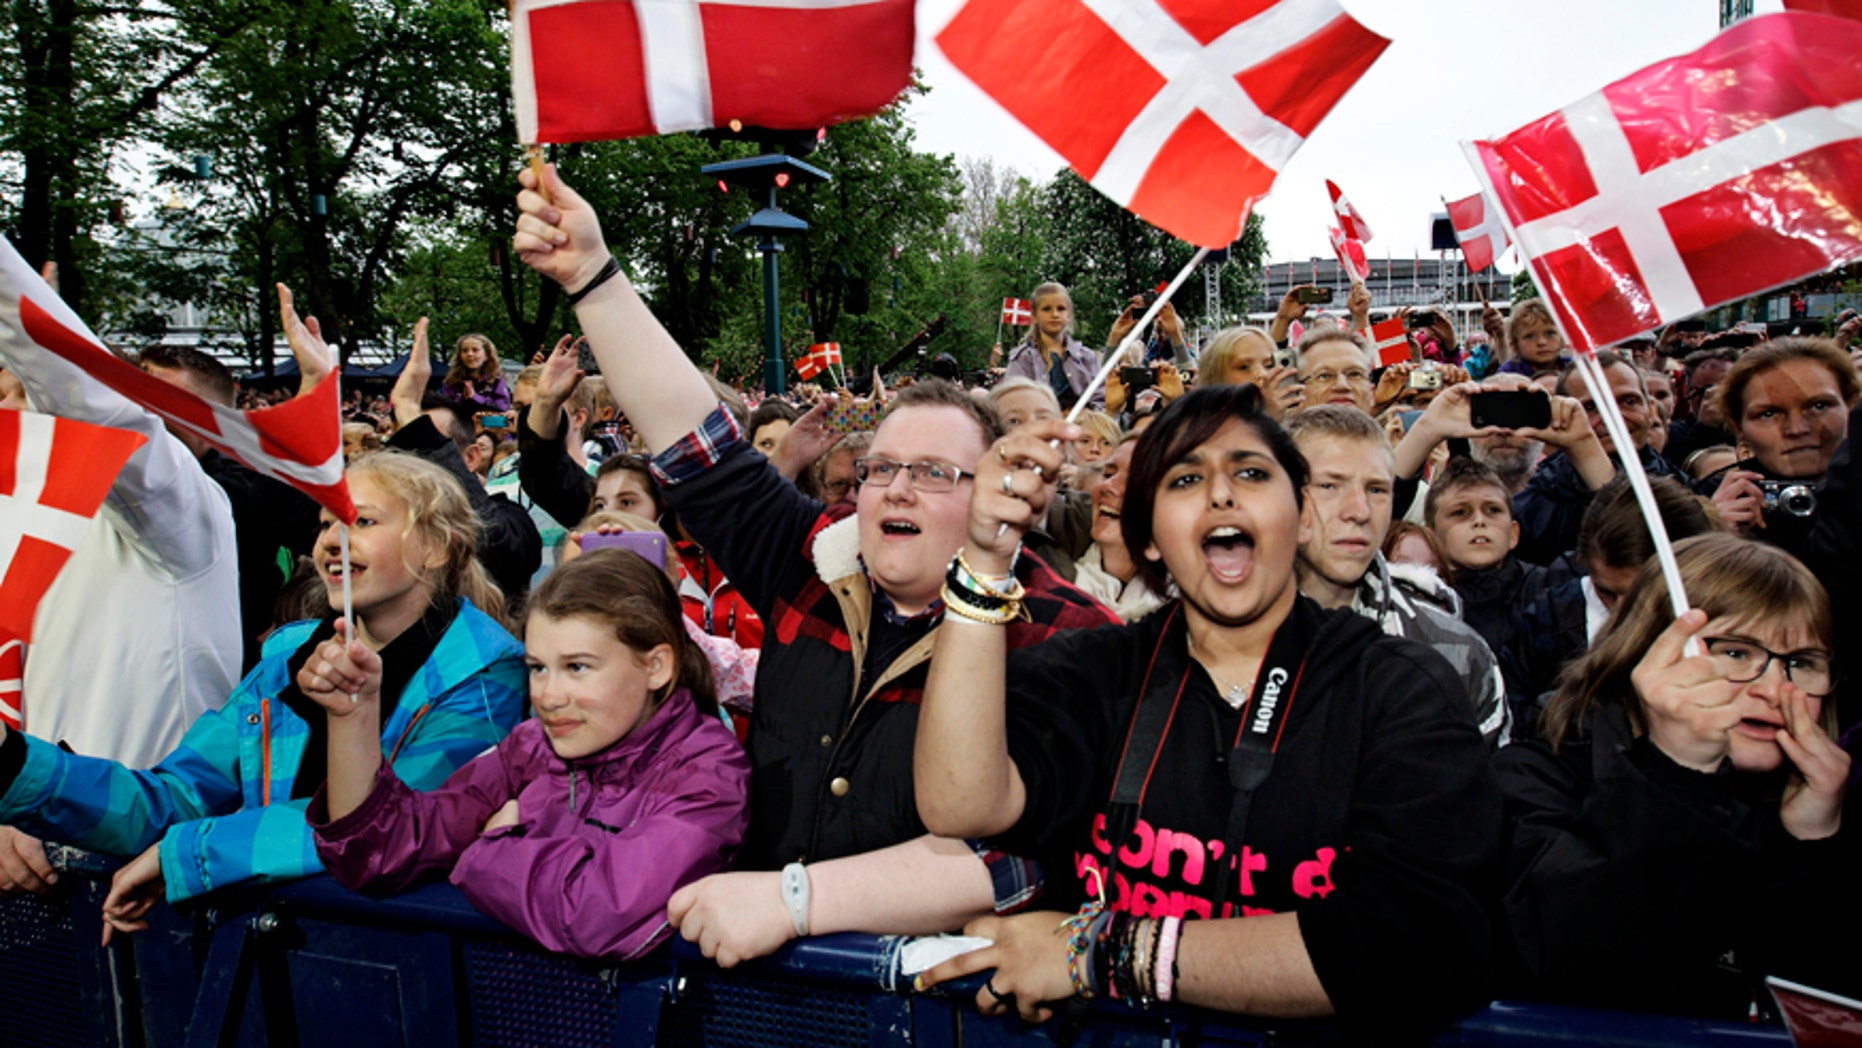 May. 19, 2013: People in Copenhagen, Denmark.